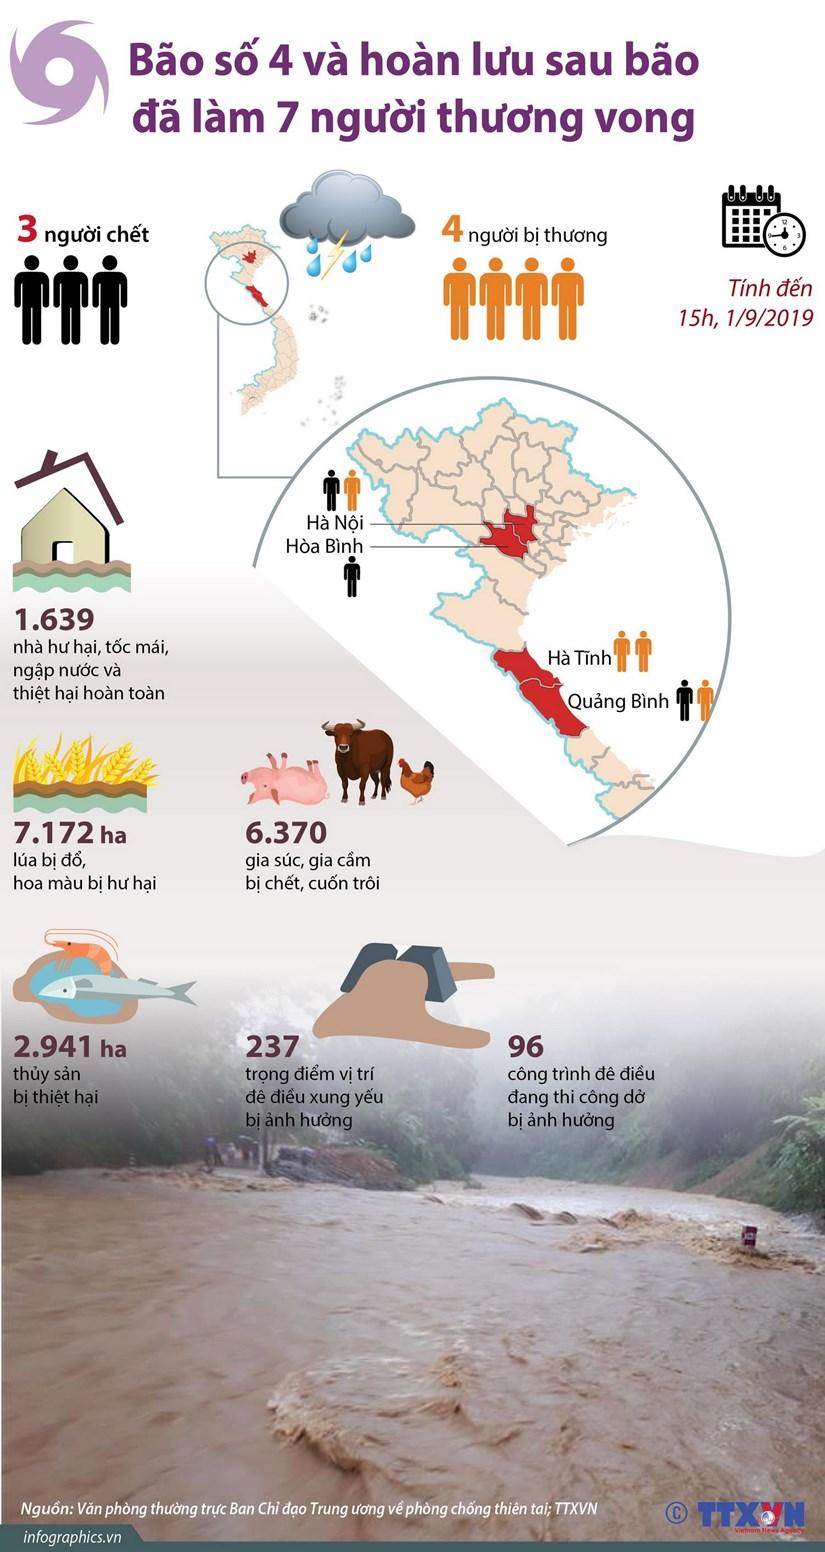 [Infographics] Thiet hai nang ne ve nguoi va tai san do bao so 4 hinh anh 1